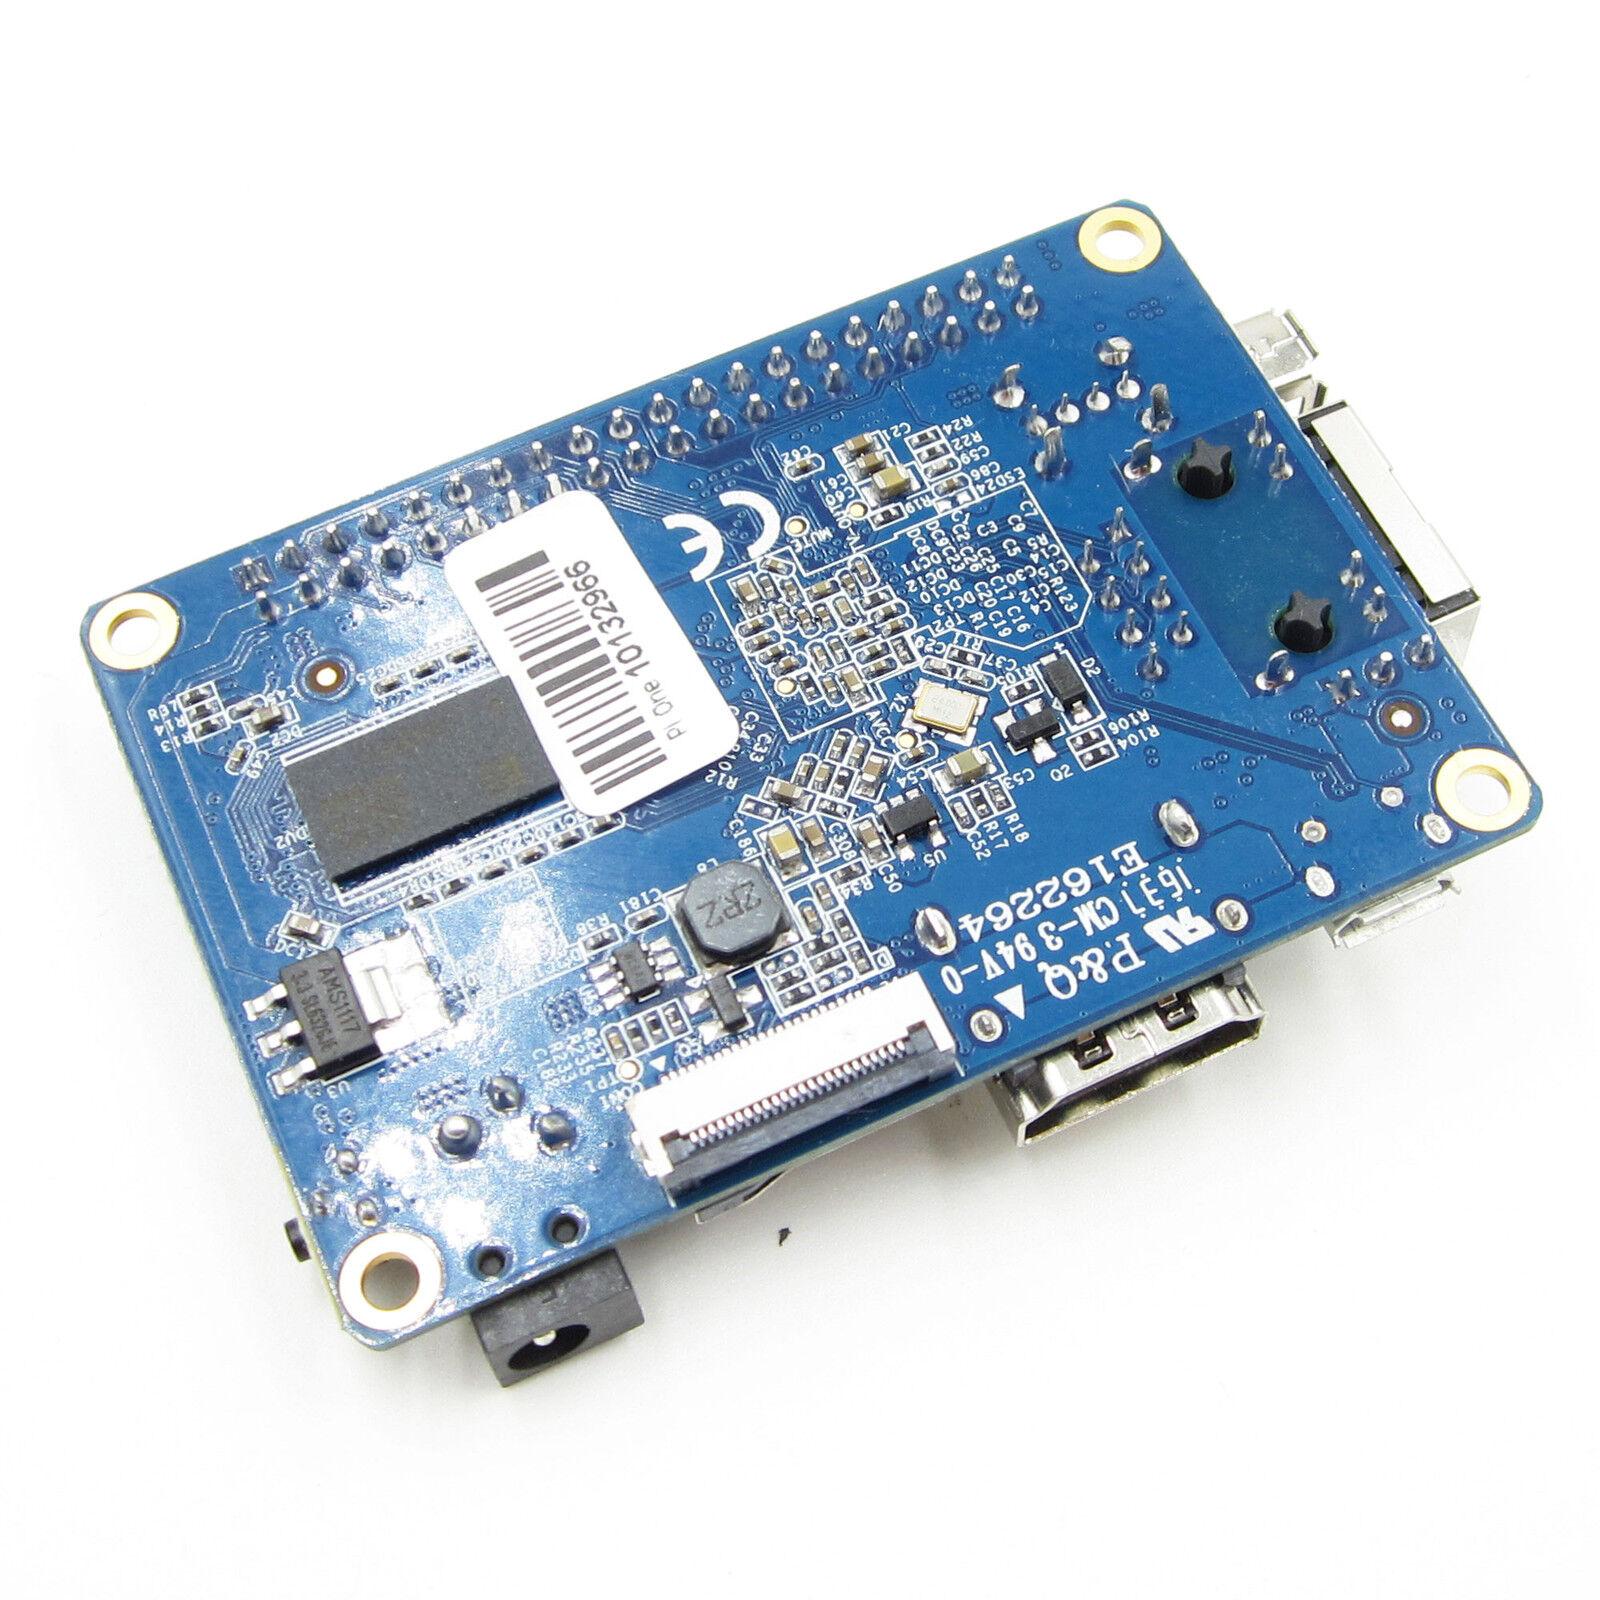 Elektronische Bauelemente Orange Pi One H3 Quad-core Support ubuntu